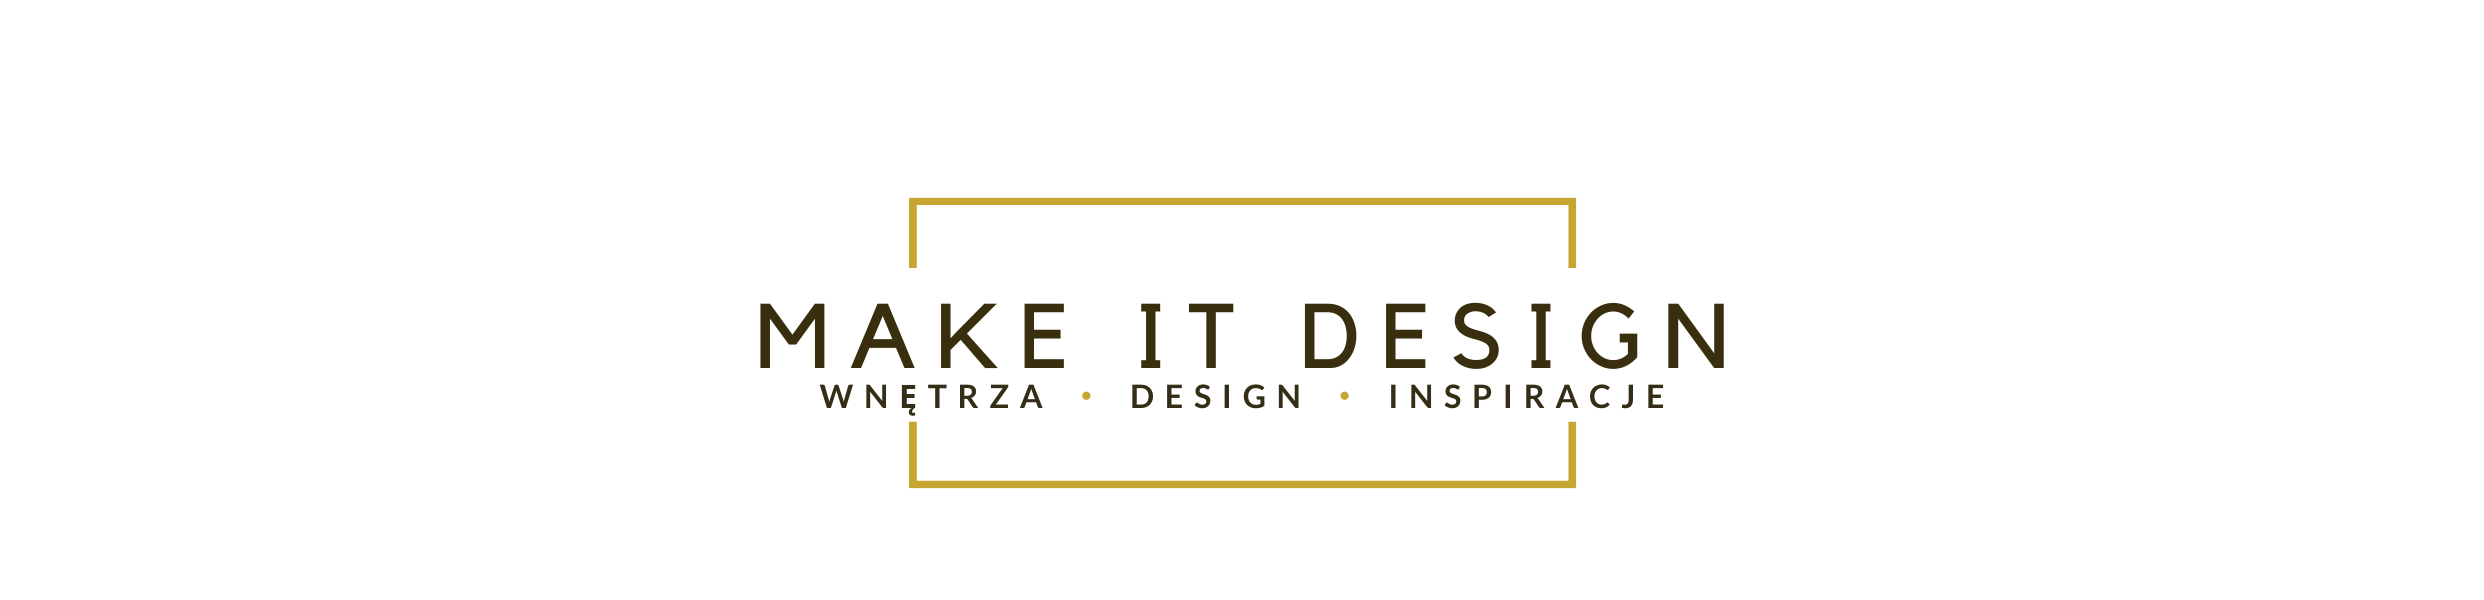 Make it design